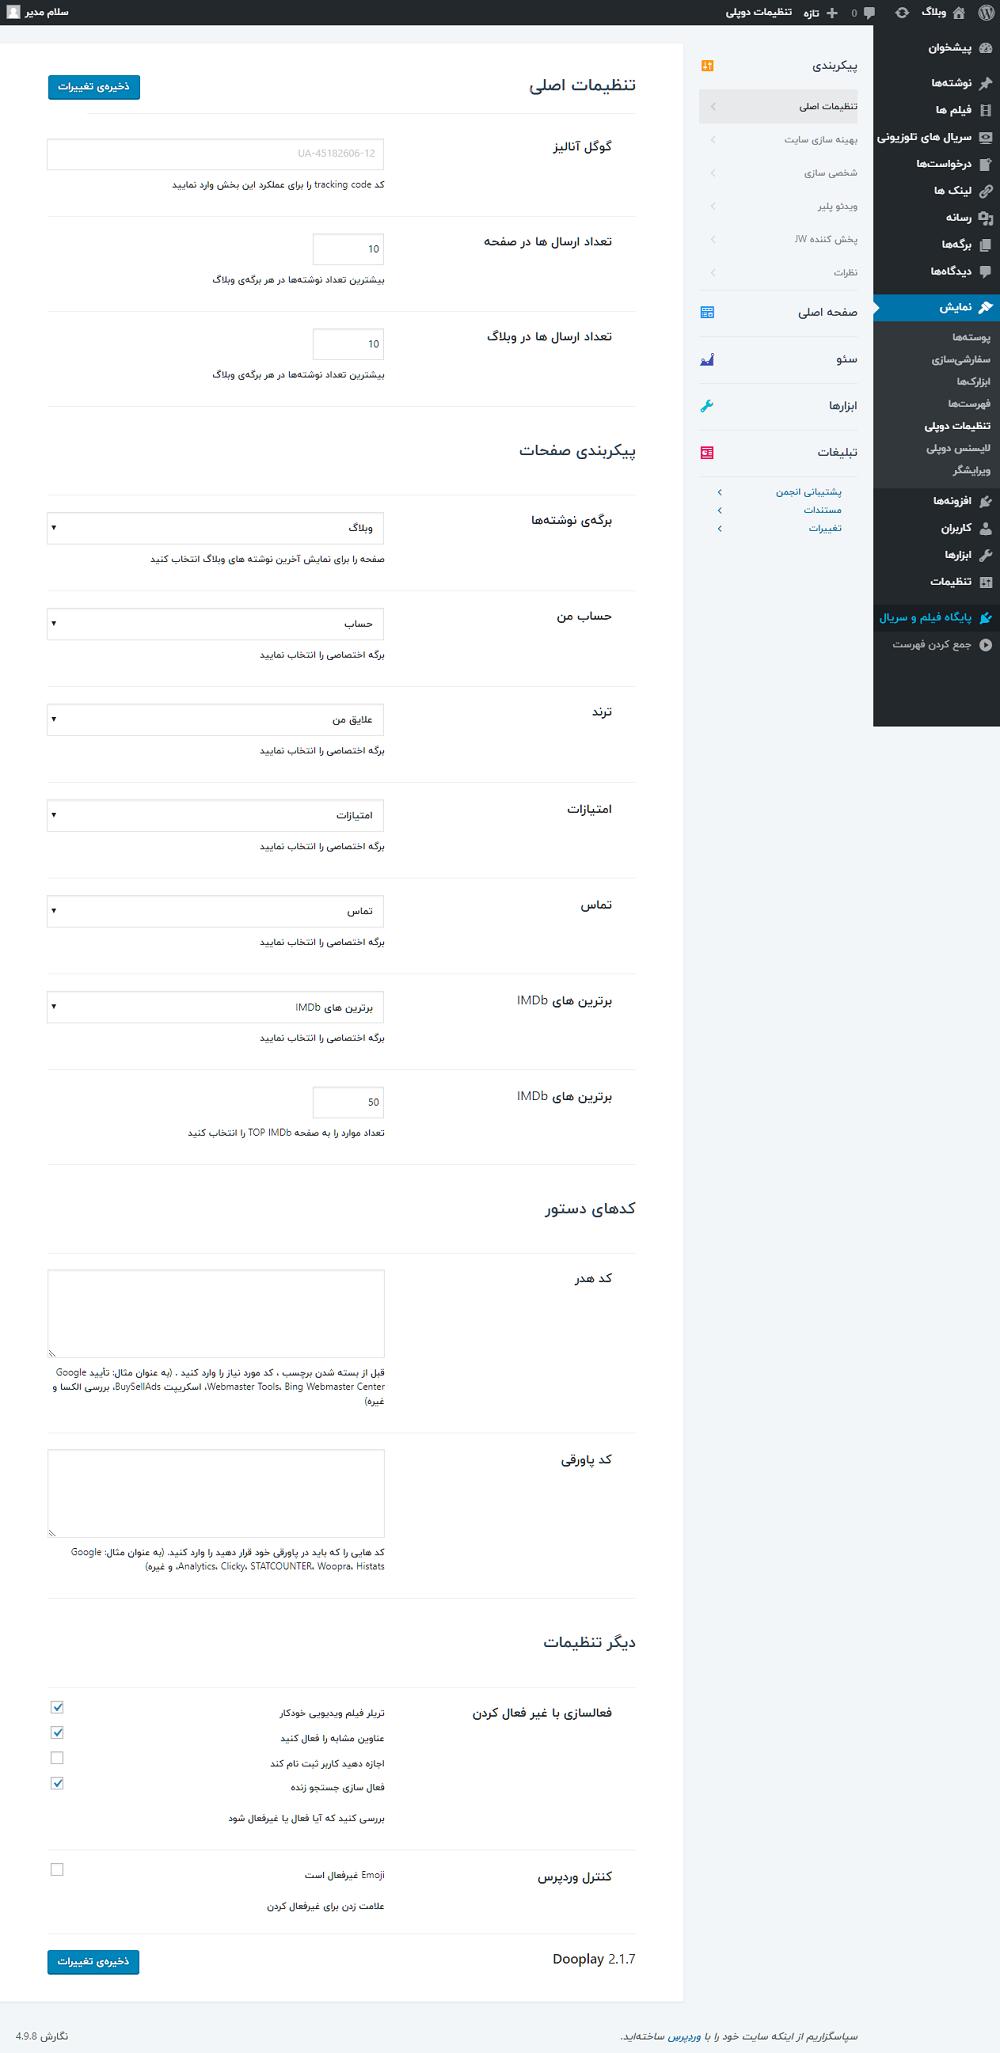 dooplay-2.1.7-پیش نمایش تصویر بخش مدیریت فارسی شده